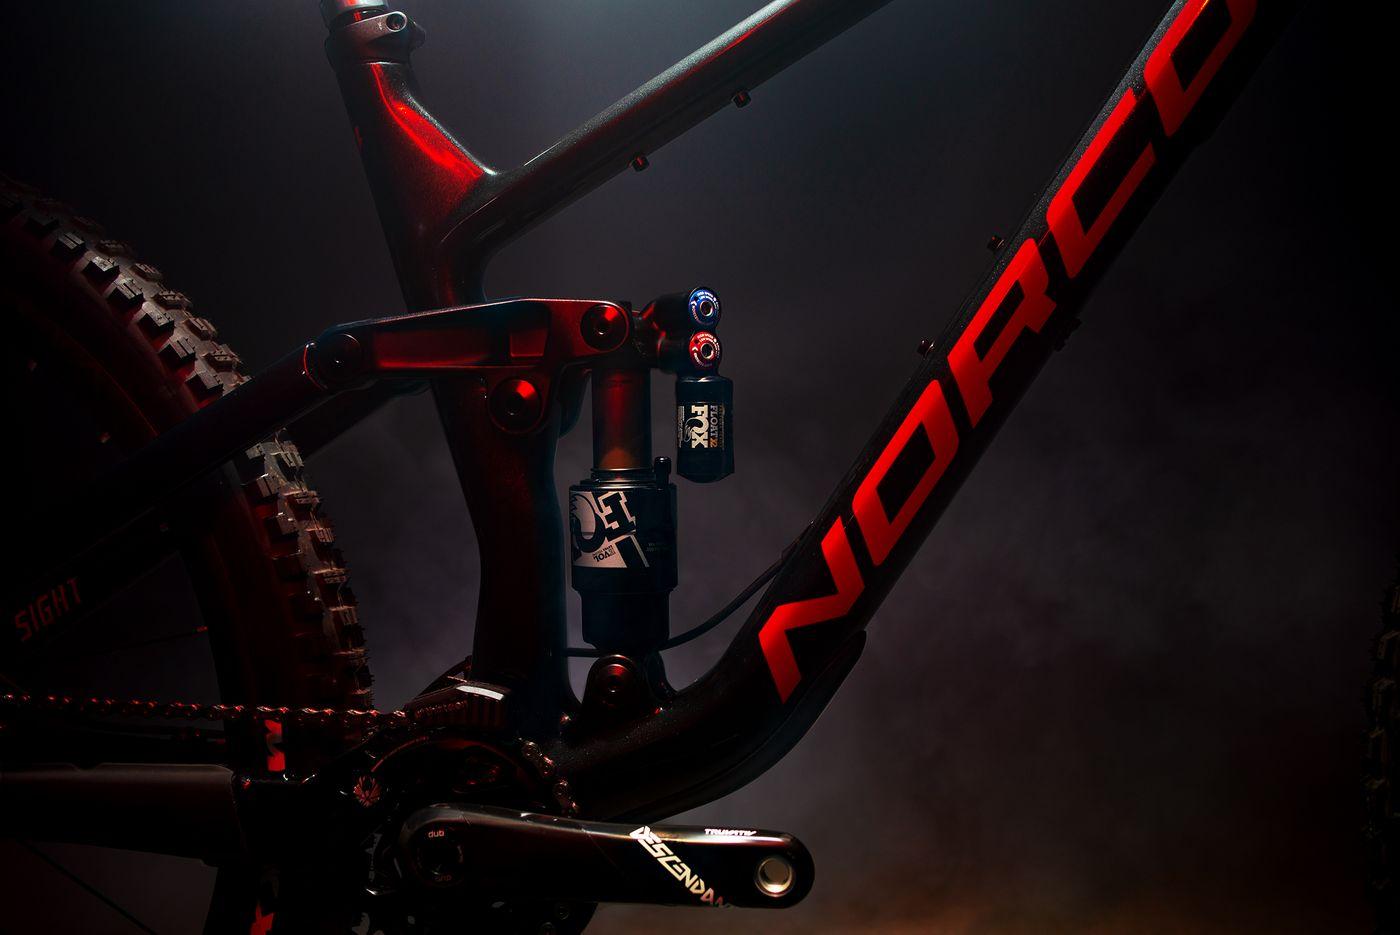 Norco-Sight-2020-Details-Federweg